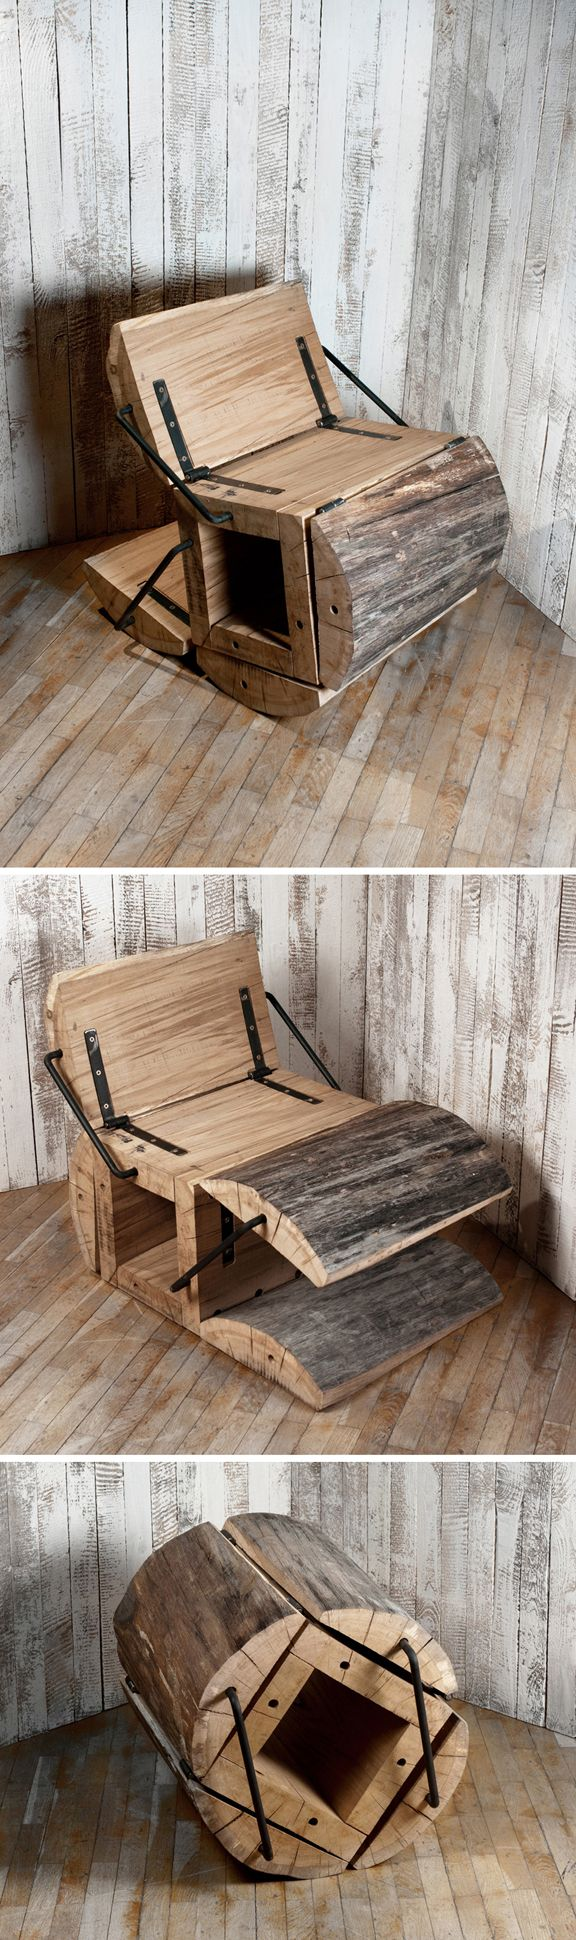 ♂ Eco gentleman Wood chair Original from http://archi-furni-interi.tumblr.com/